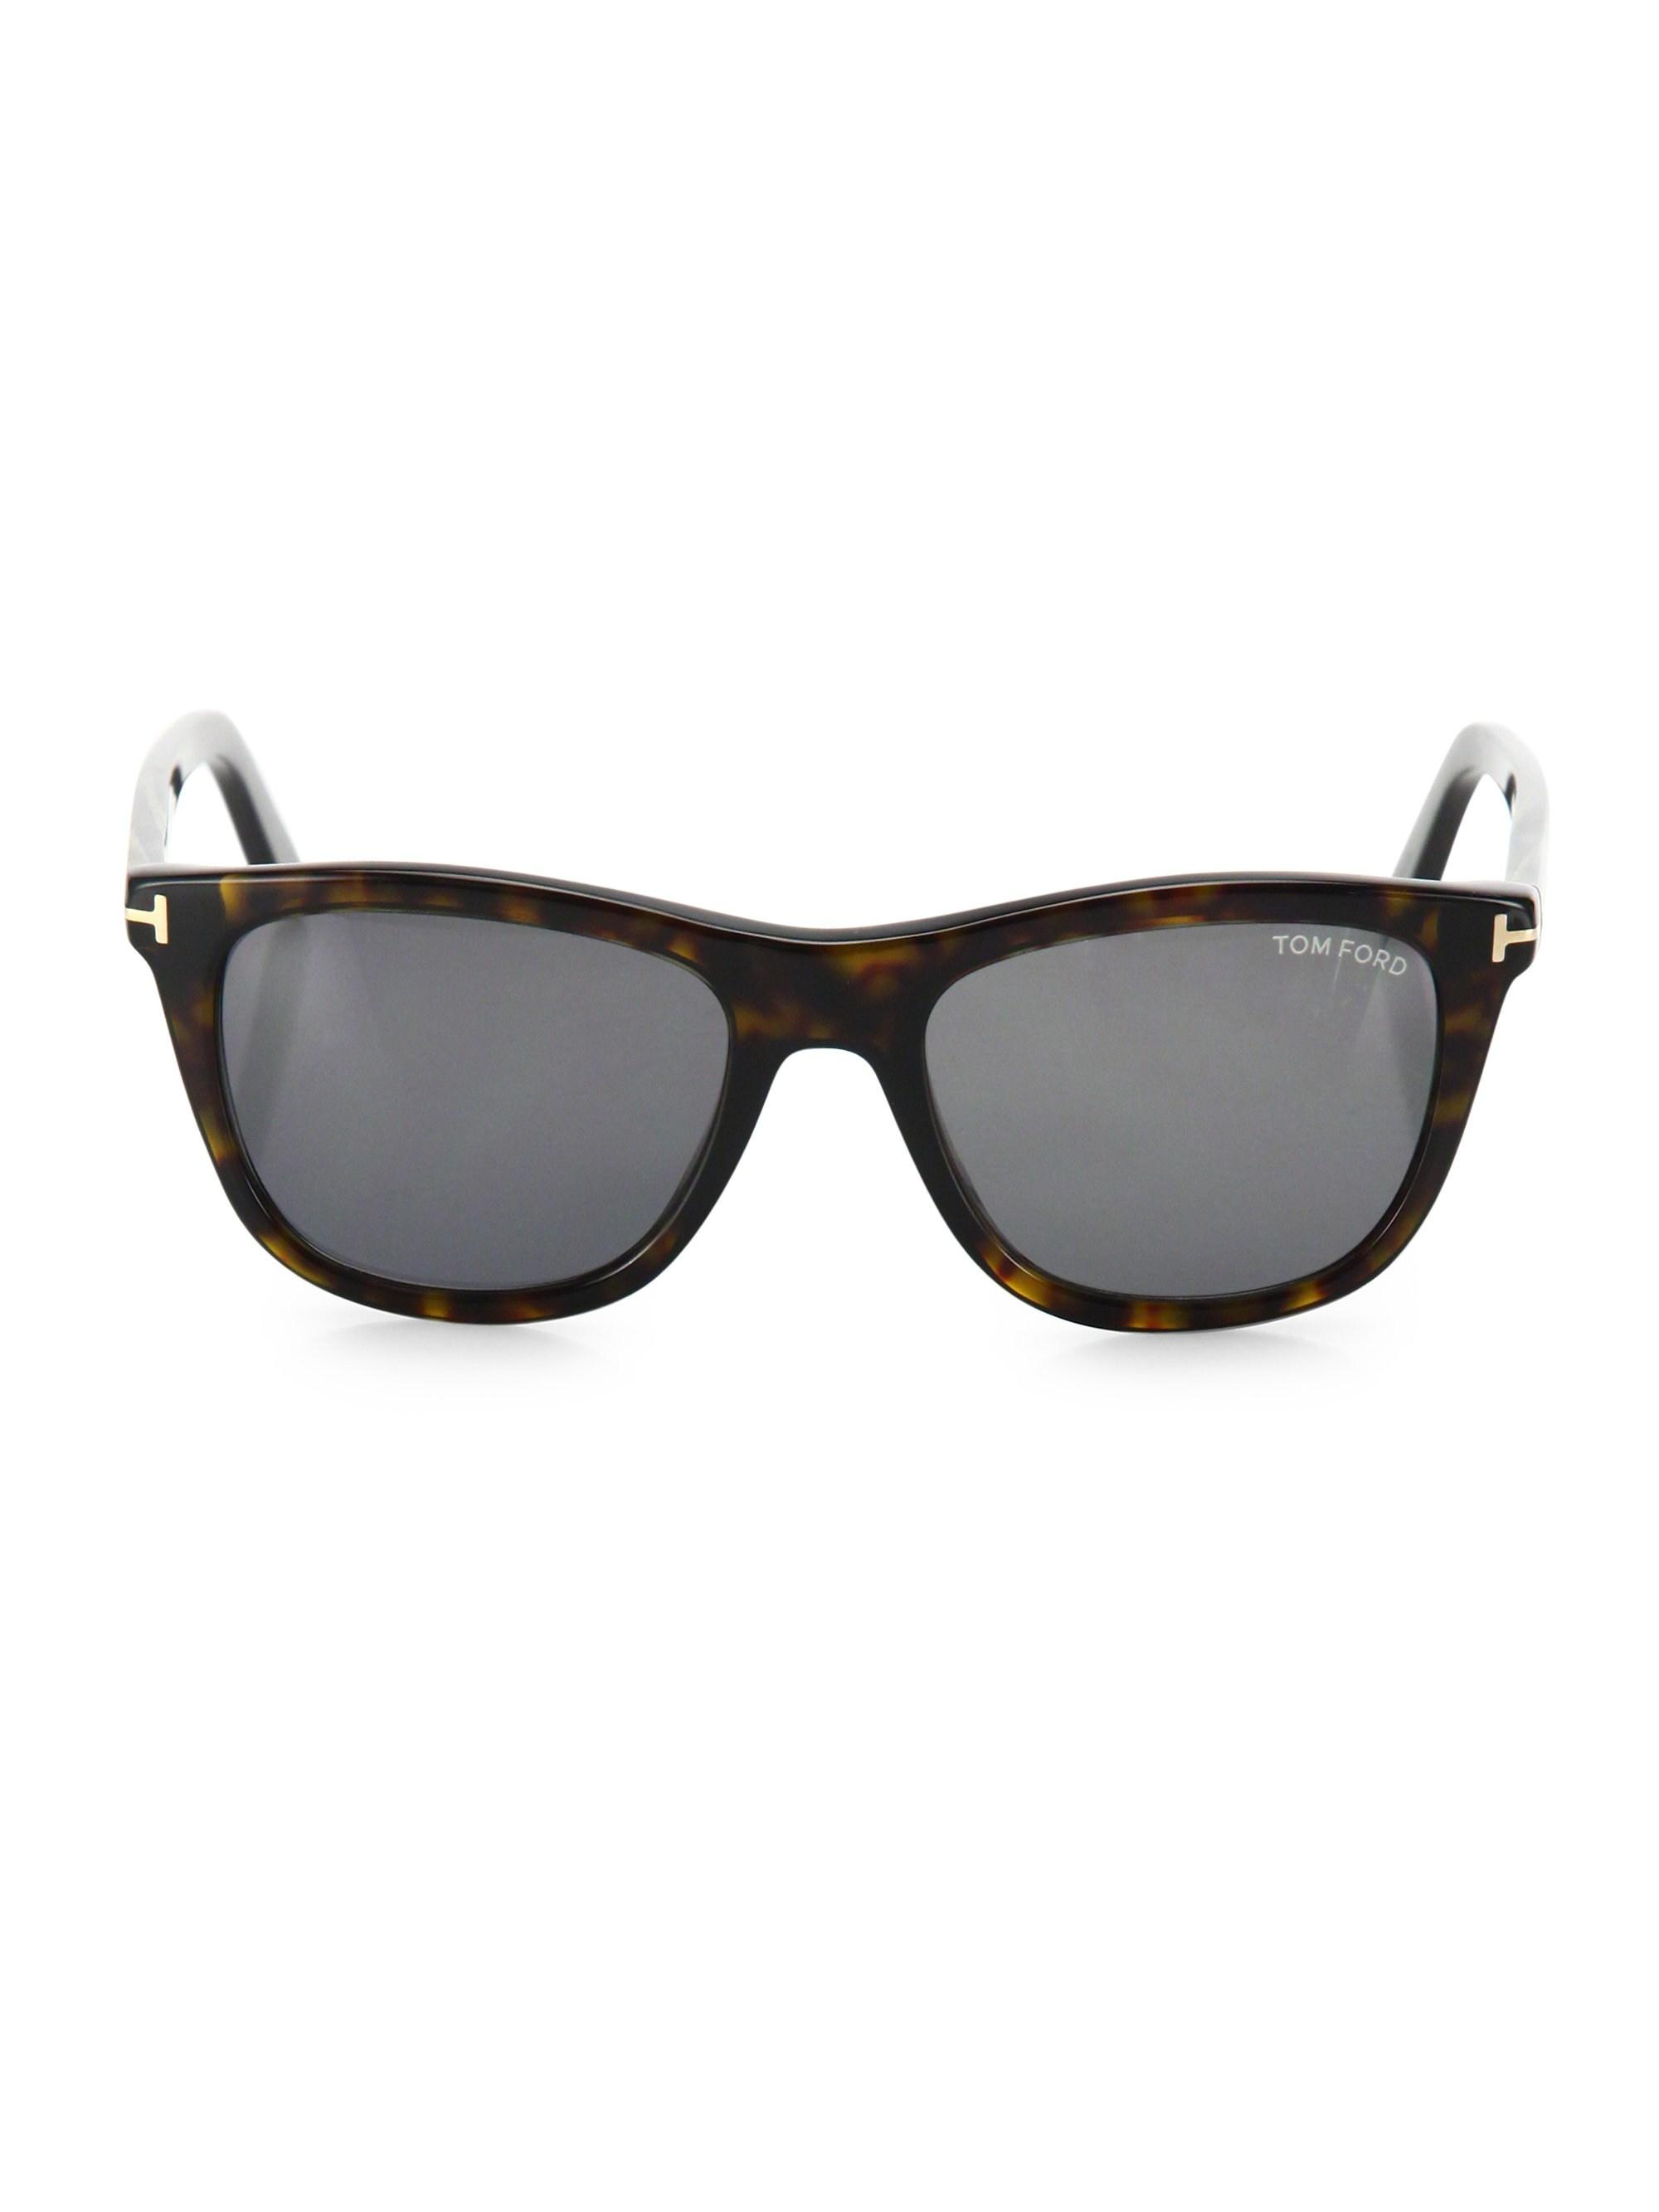 9dddd1632cea3 Tom Ford - Black Andrew 54mm Square Sunglasses for Men - Lyst. View  fullscreen